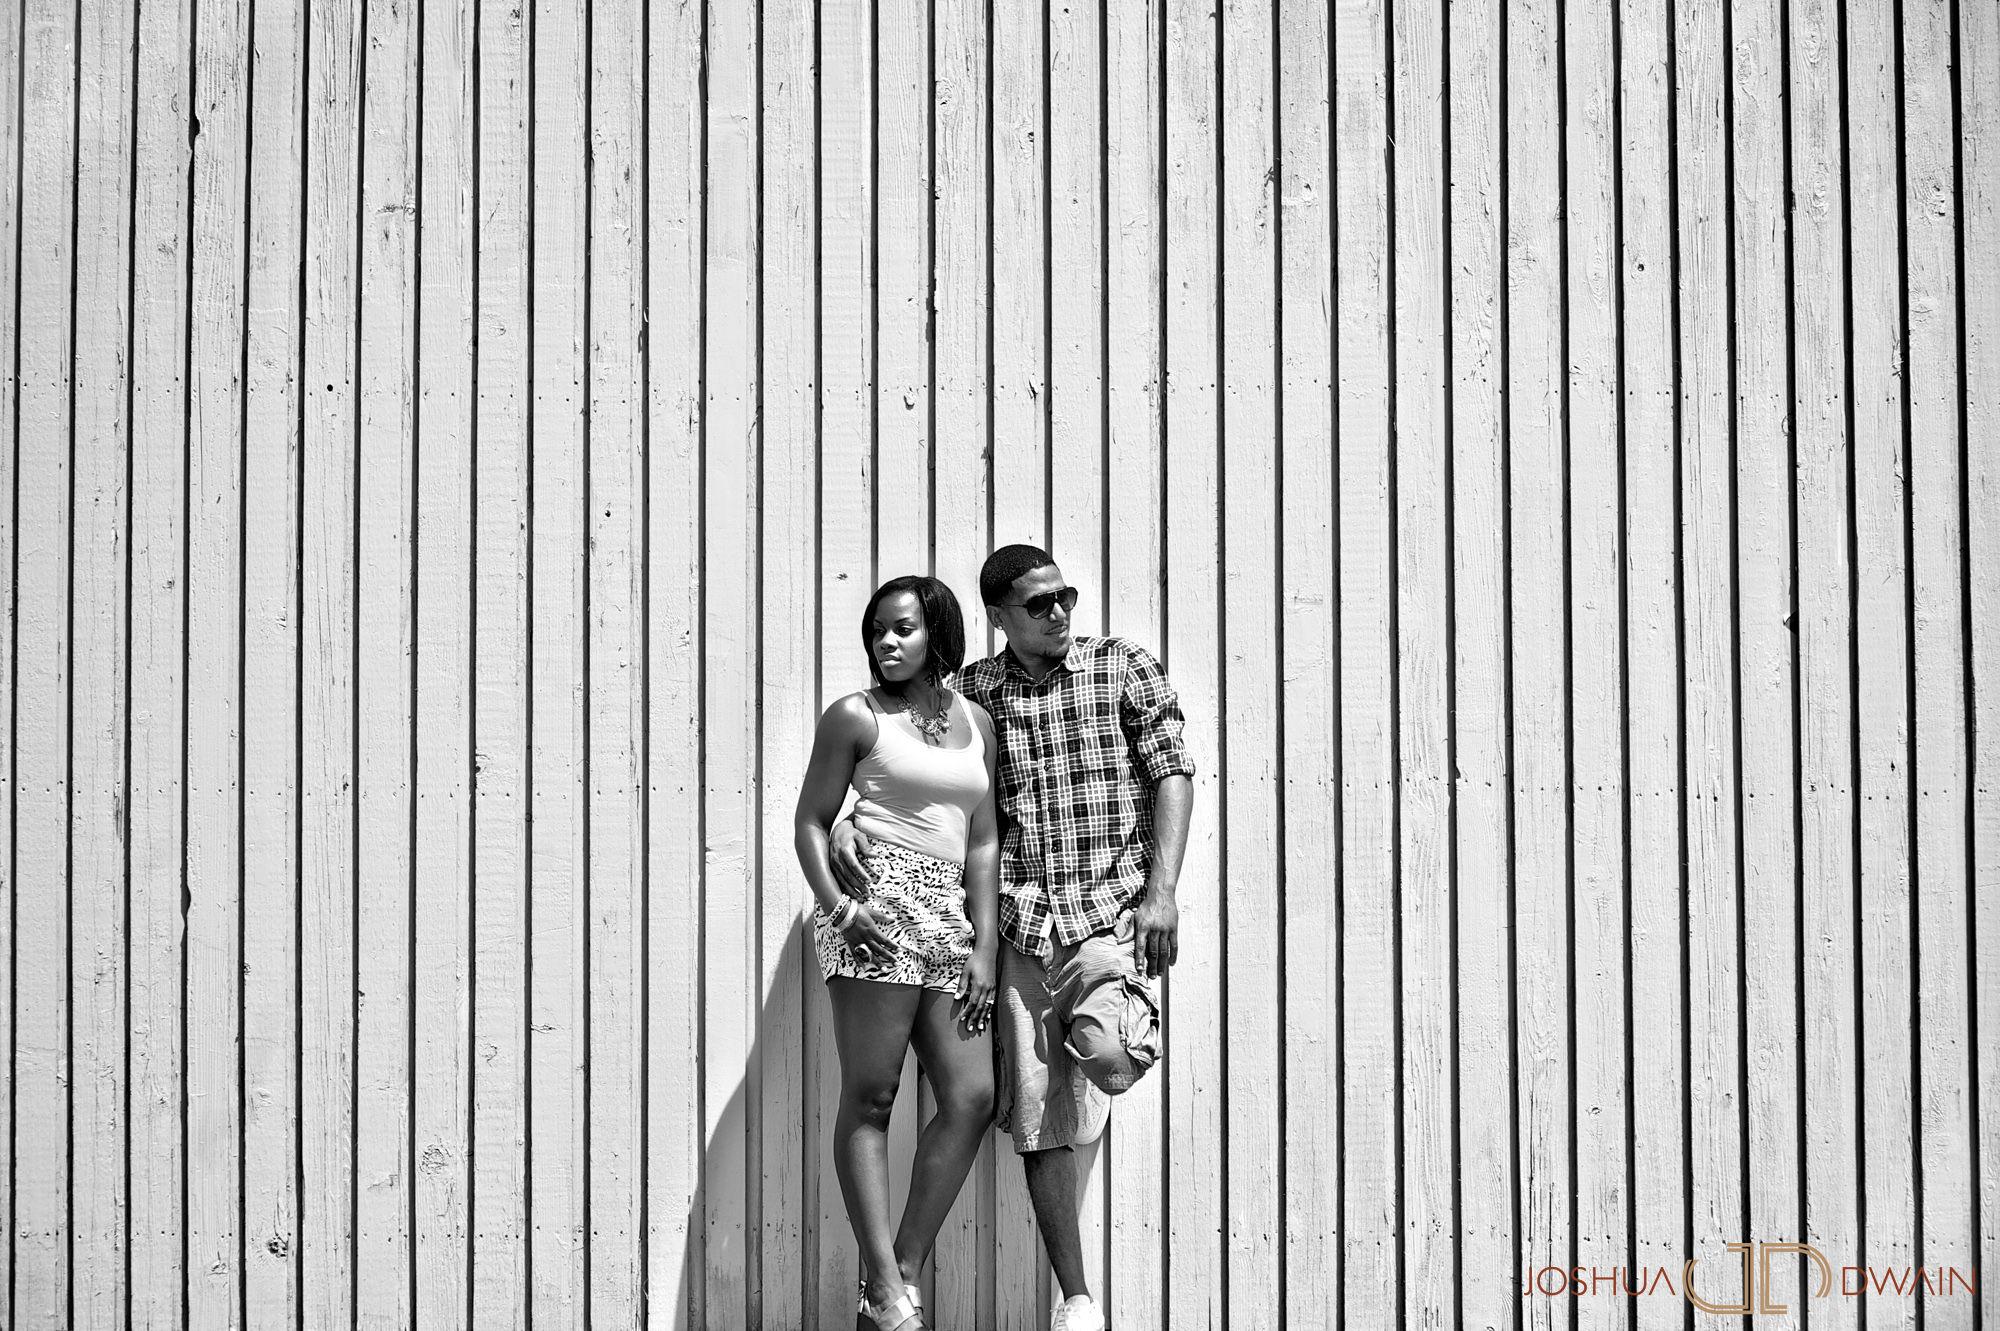 lucette-stephen-002-coney-island-brooklyn-ny-engagement-photographer-joshua-dwain-2011-07-02_ls_009